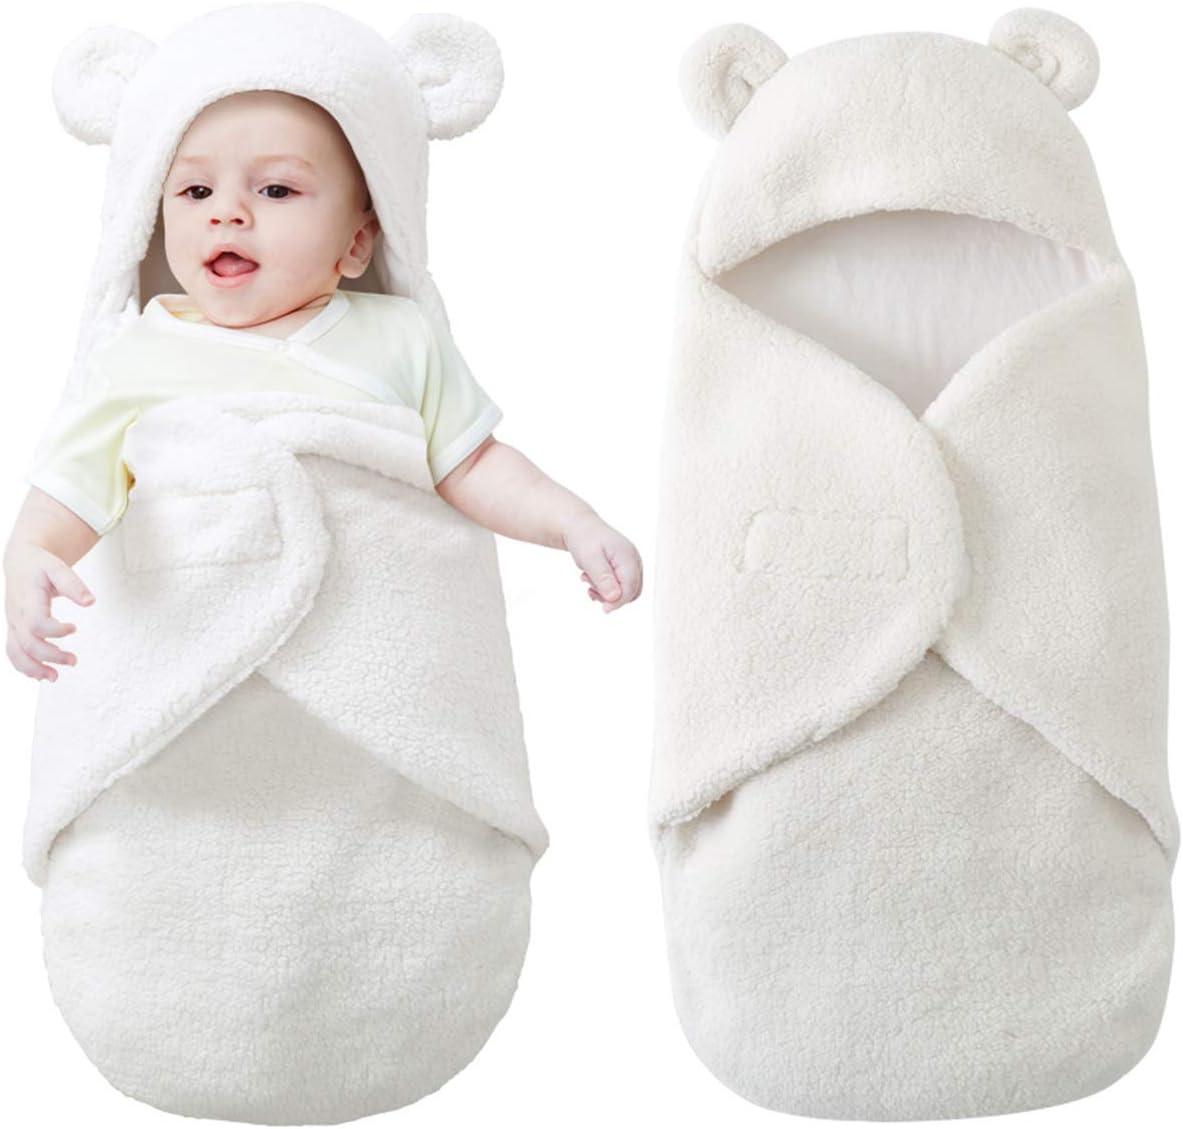 Baby Swaddle Wrap Blanket Sleeping Bag Newborn Faux cashmere Hooded Sleepsacks